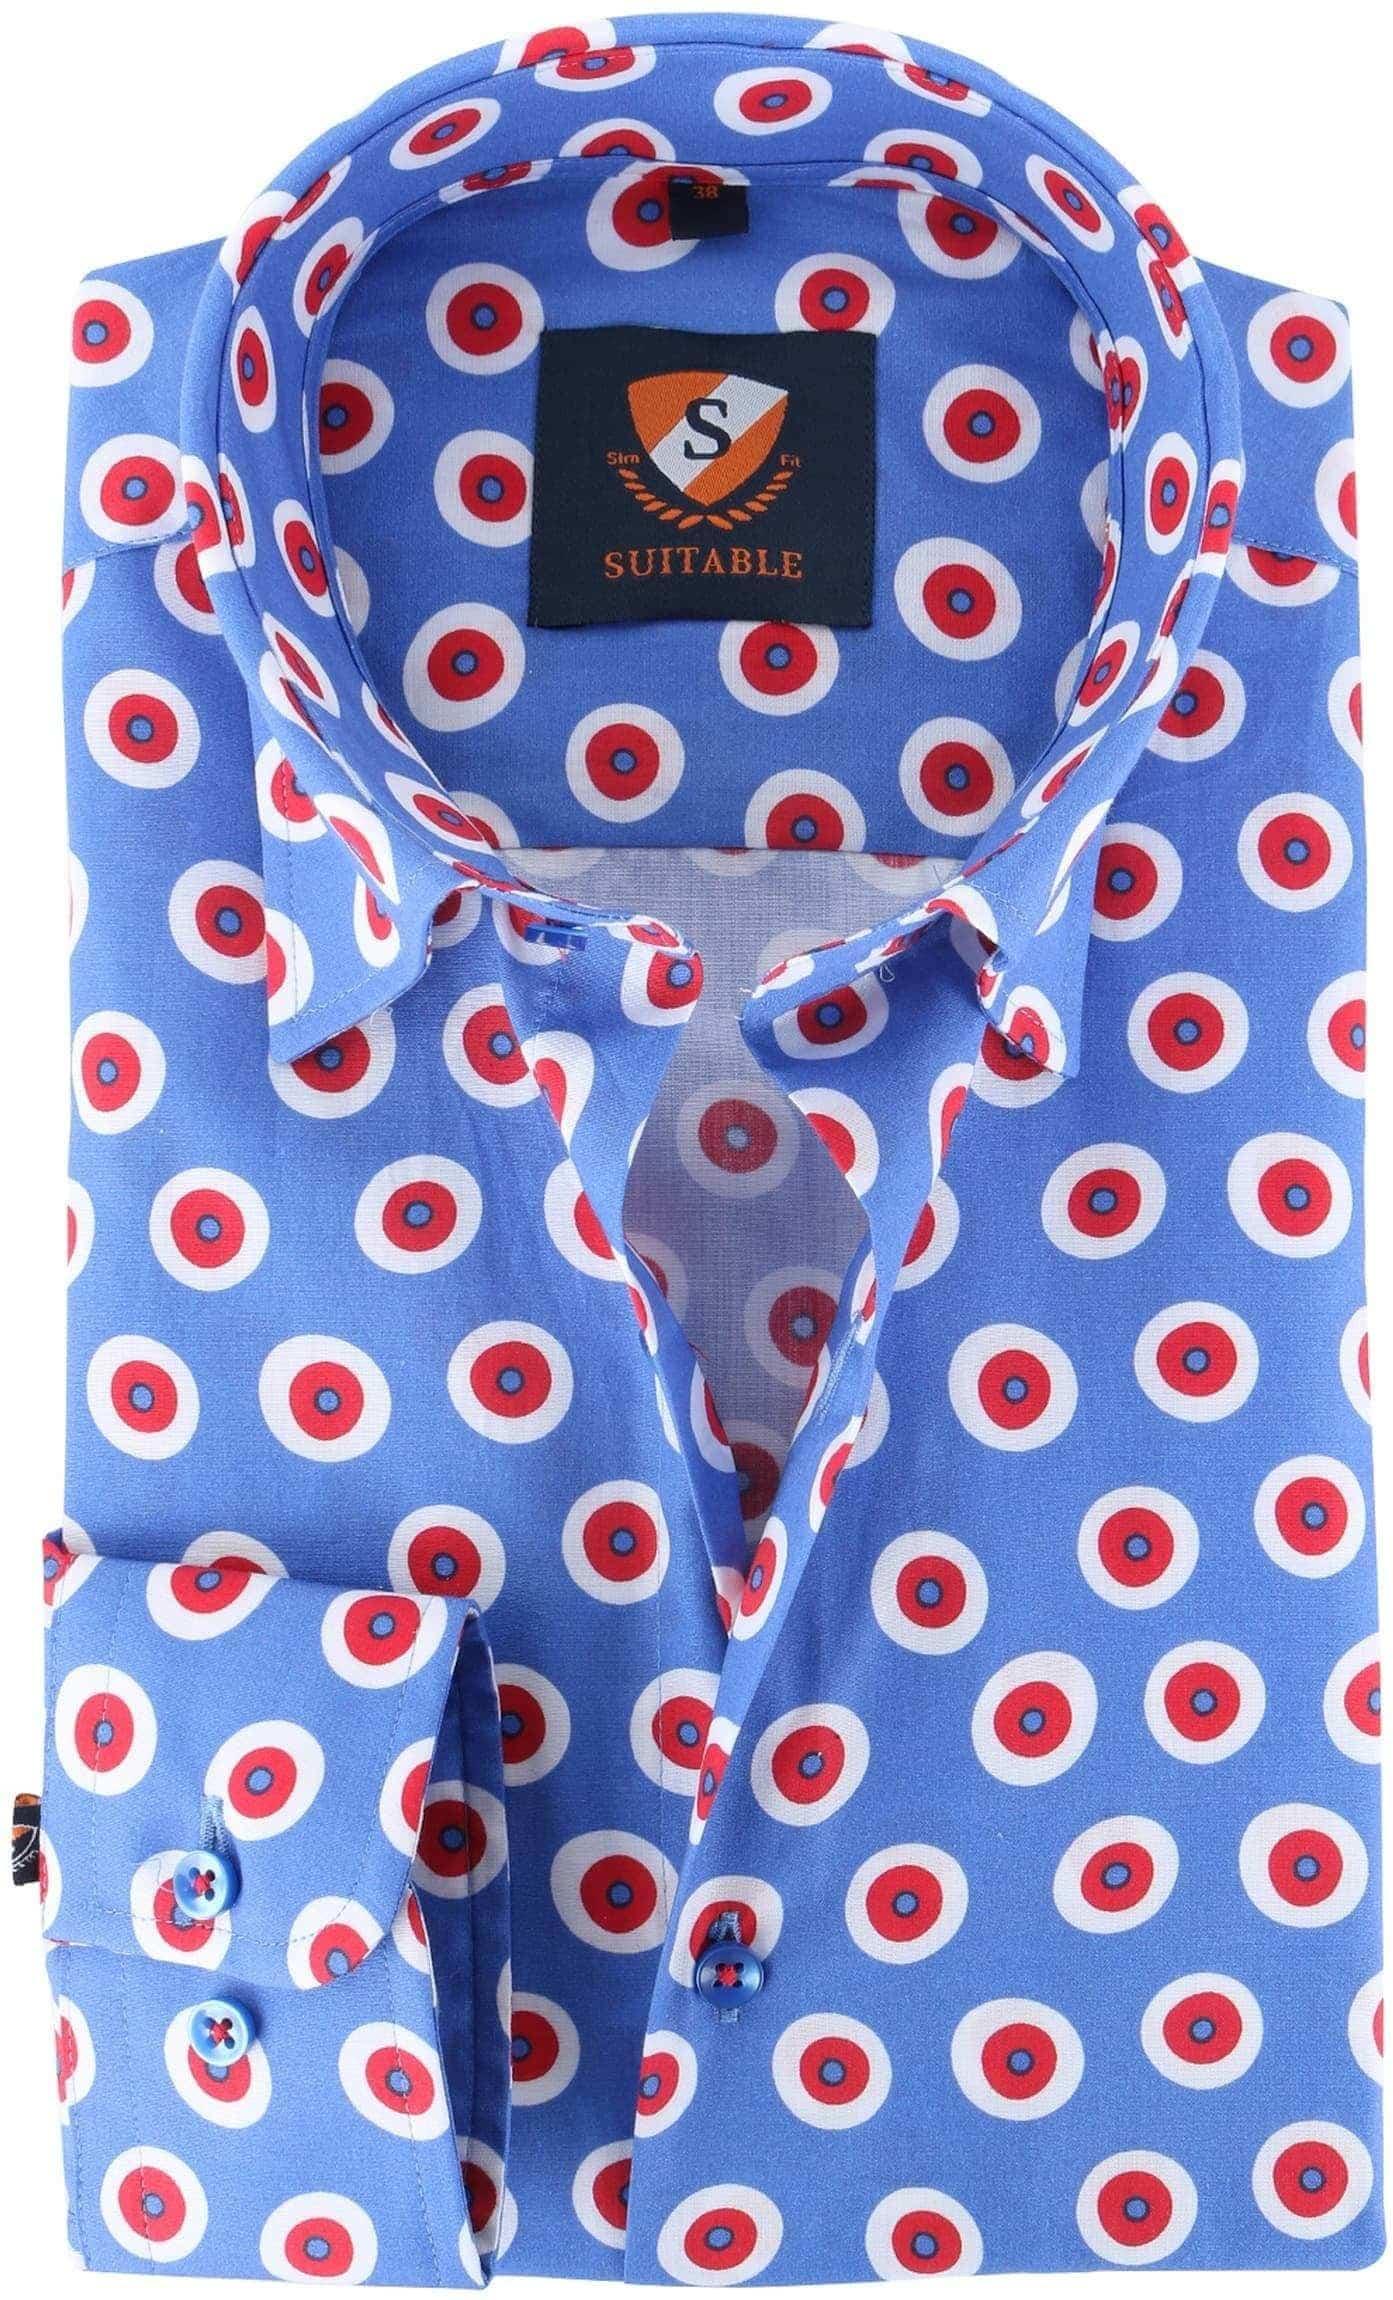 Suitable Overhemd Blauw Rood 141-4 foto 0